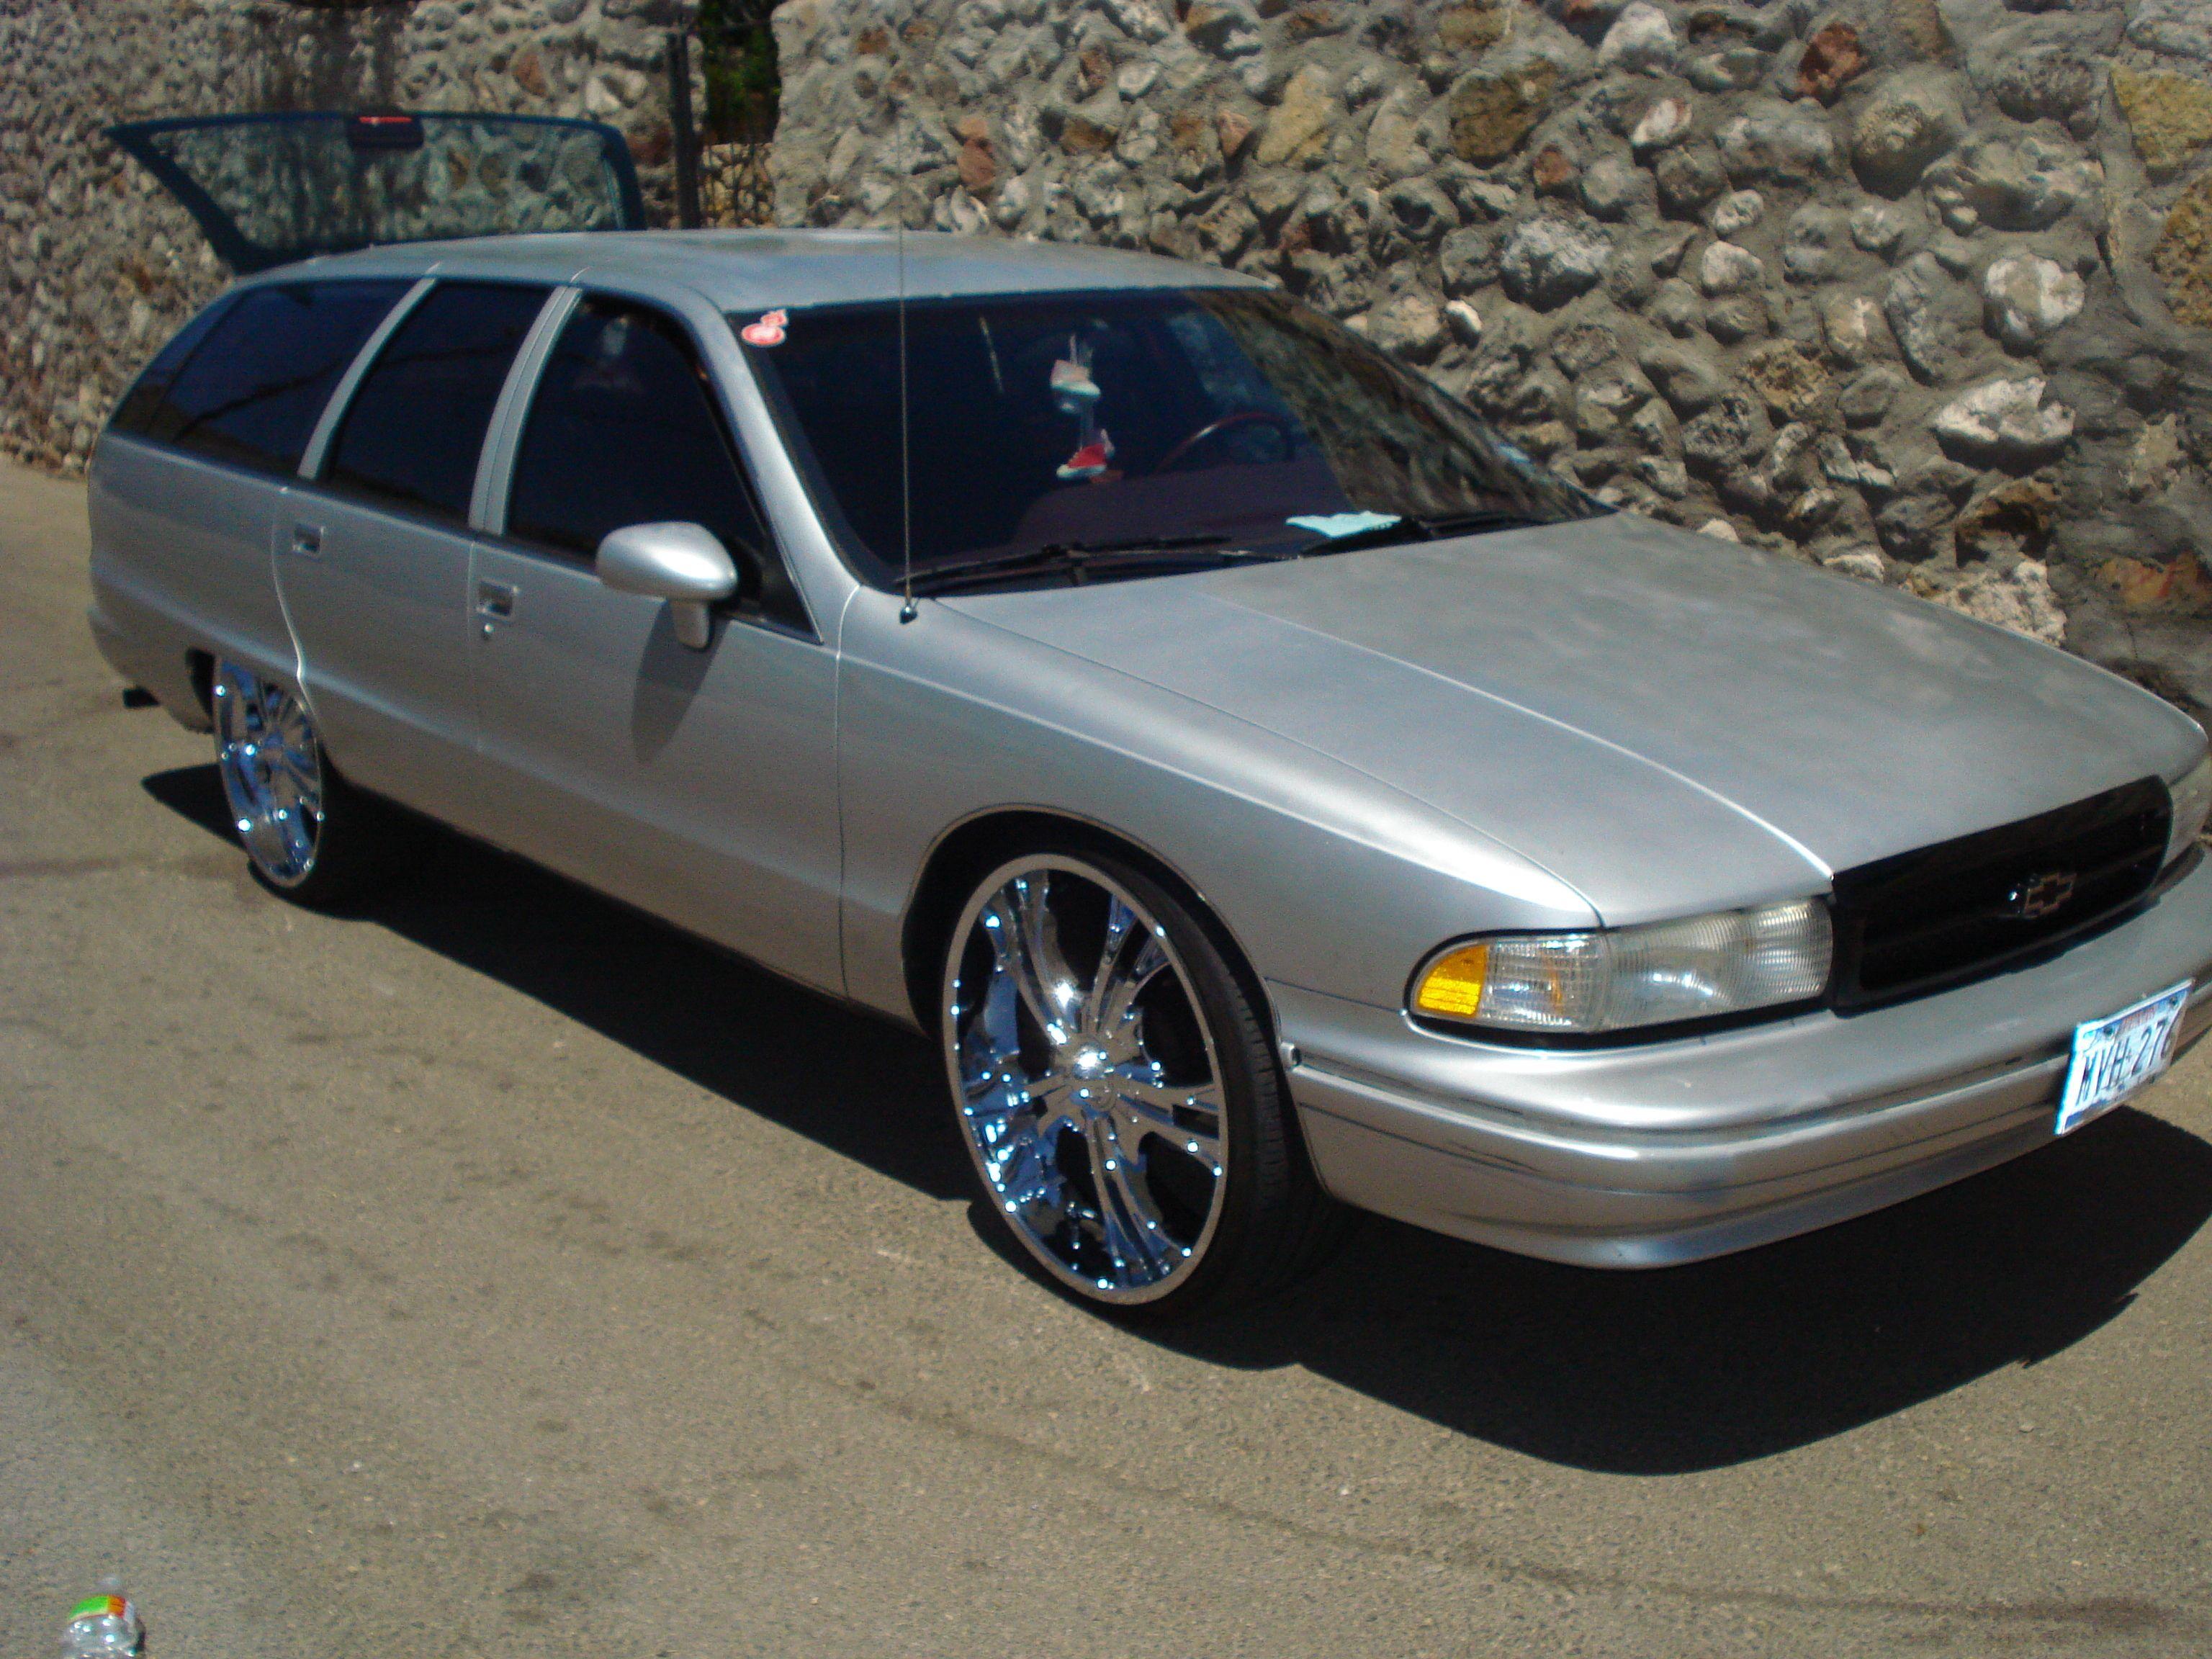 hight resolution of 1995 chevy caprice impala ss wagon